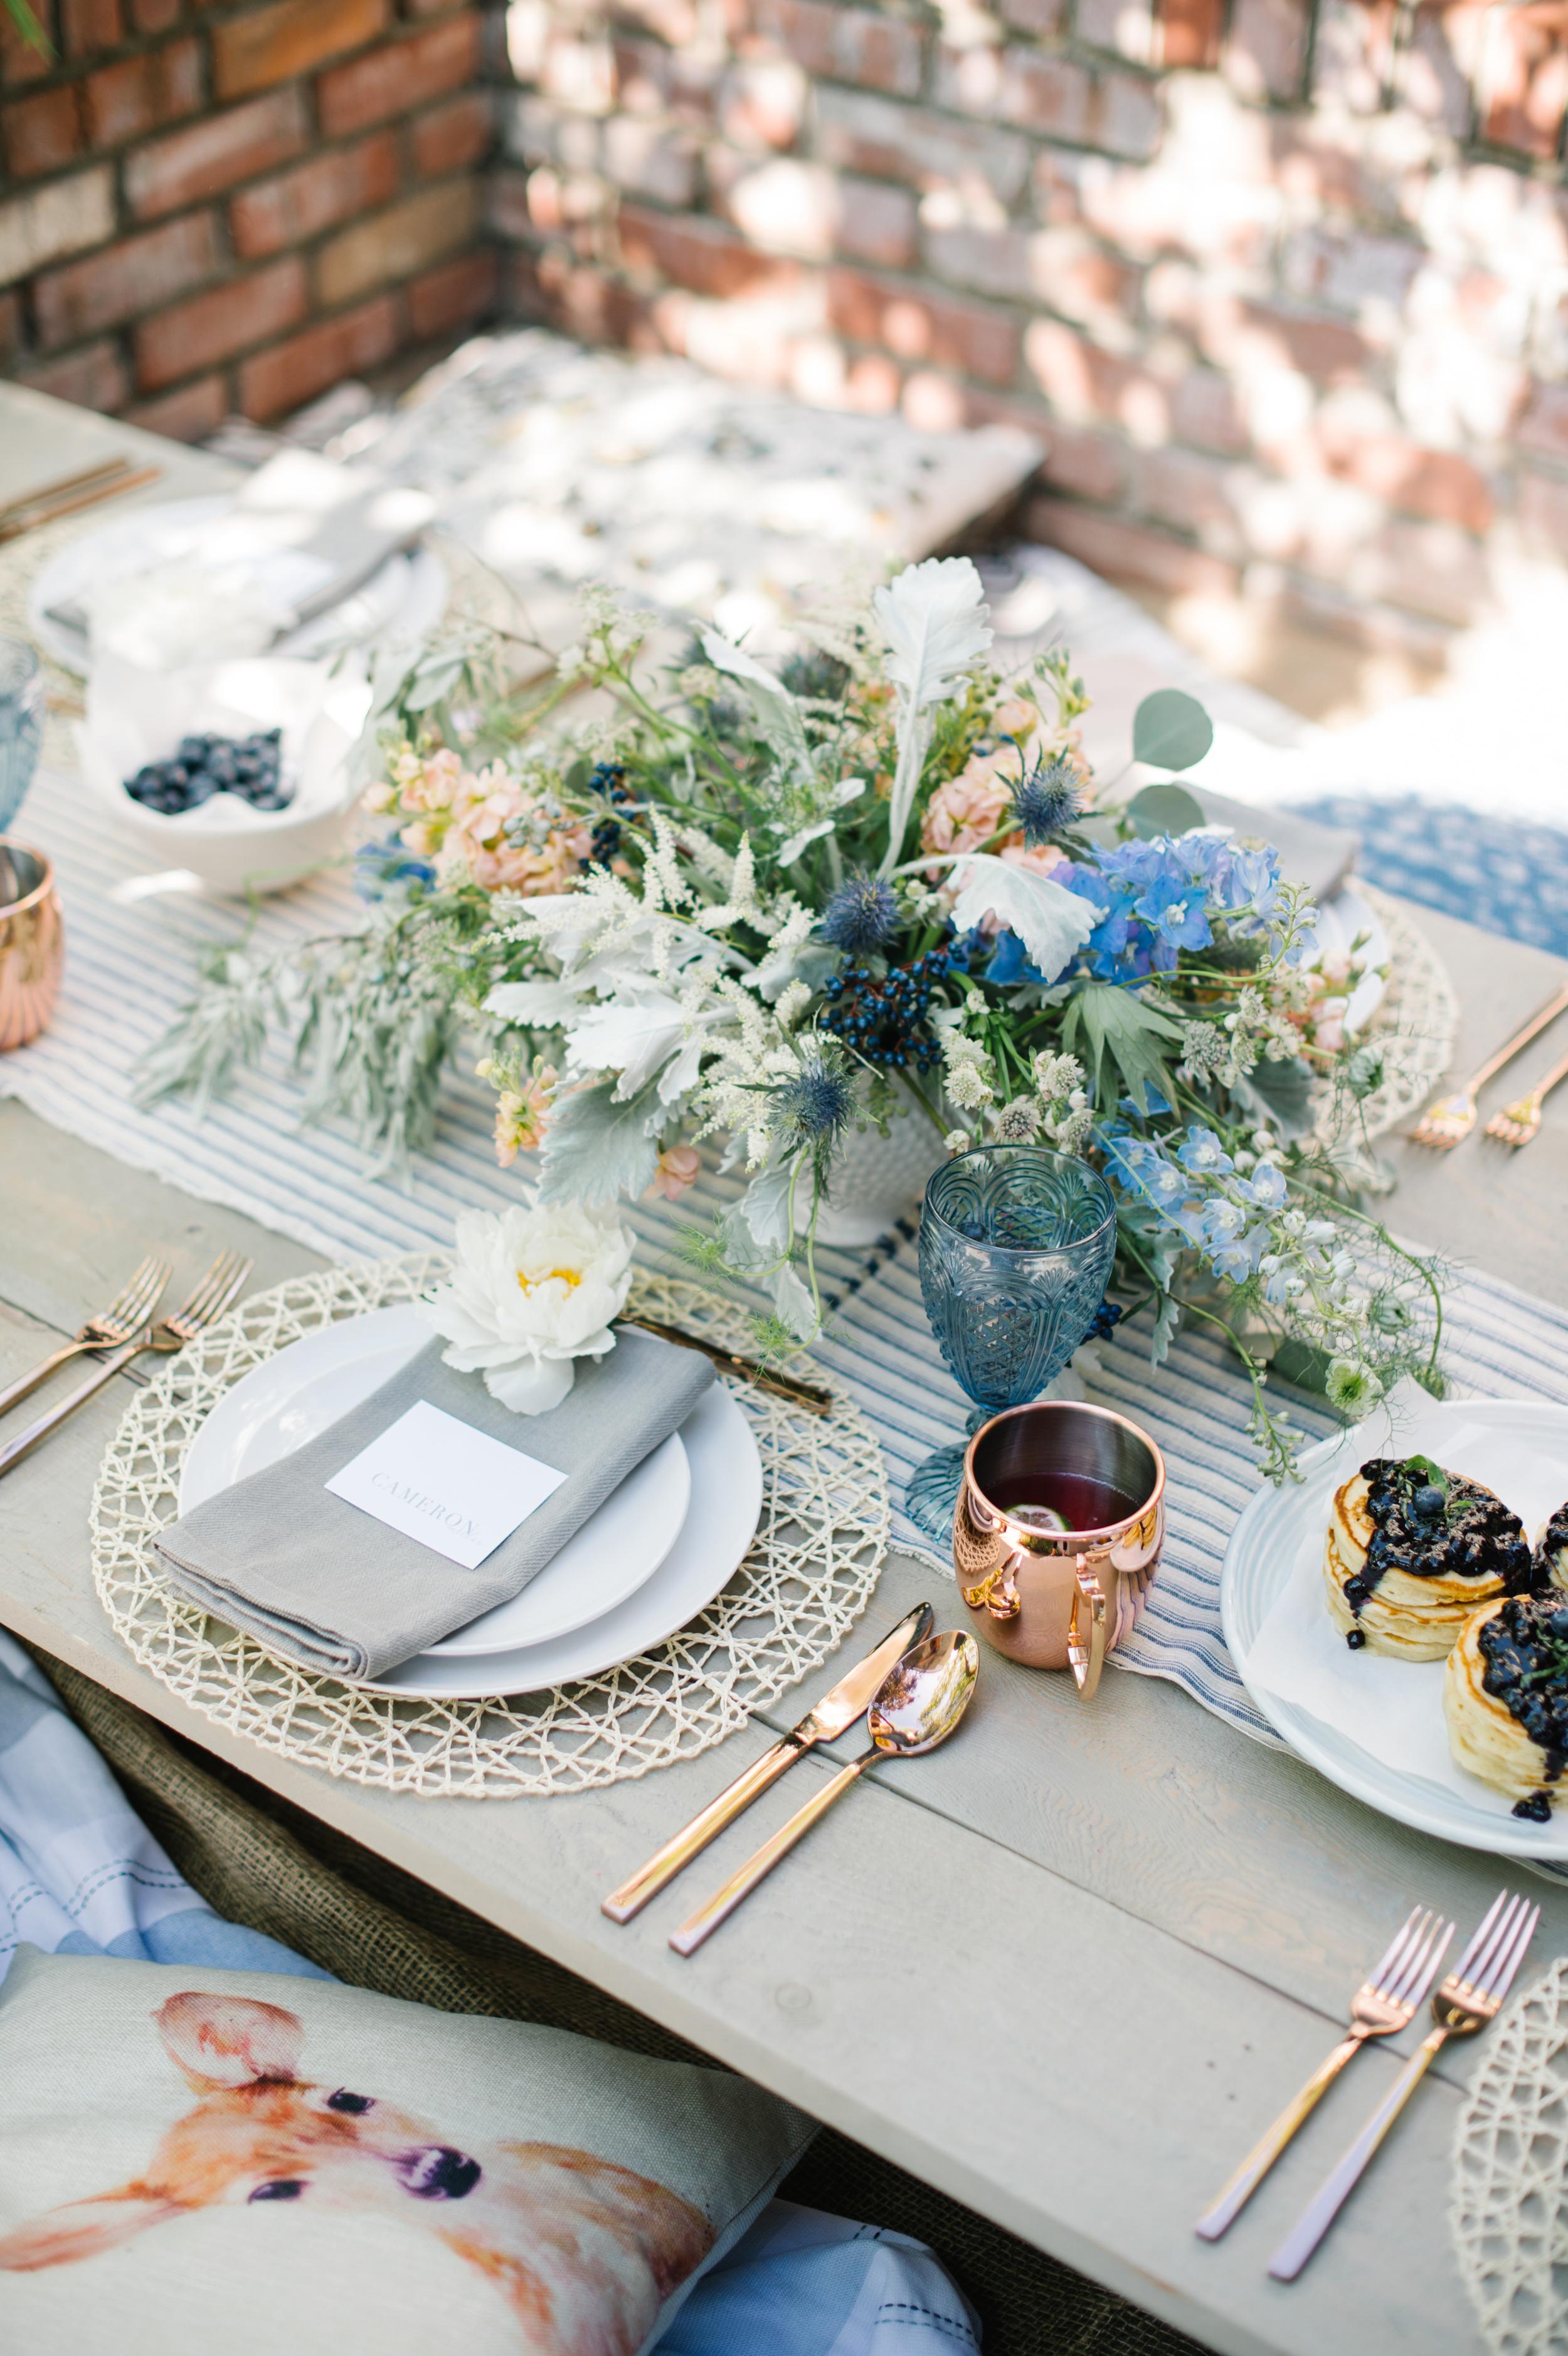 100 Layer Cake:Backyard summer brunch wedding inspiration. Click for more.